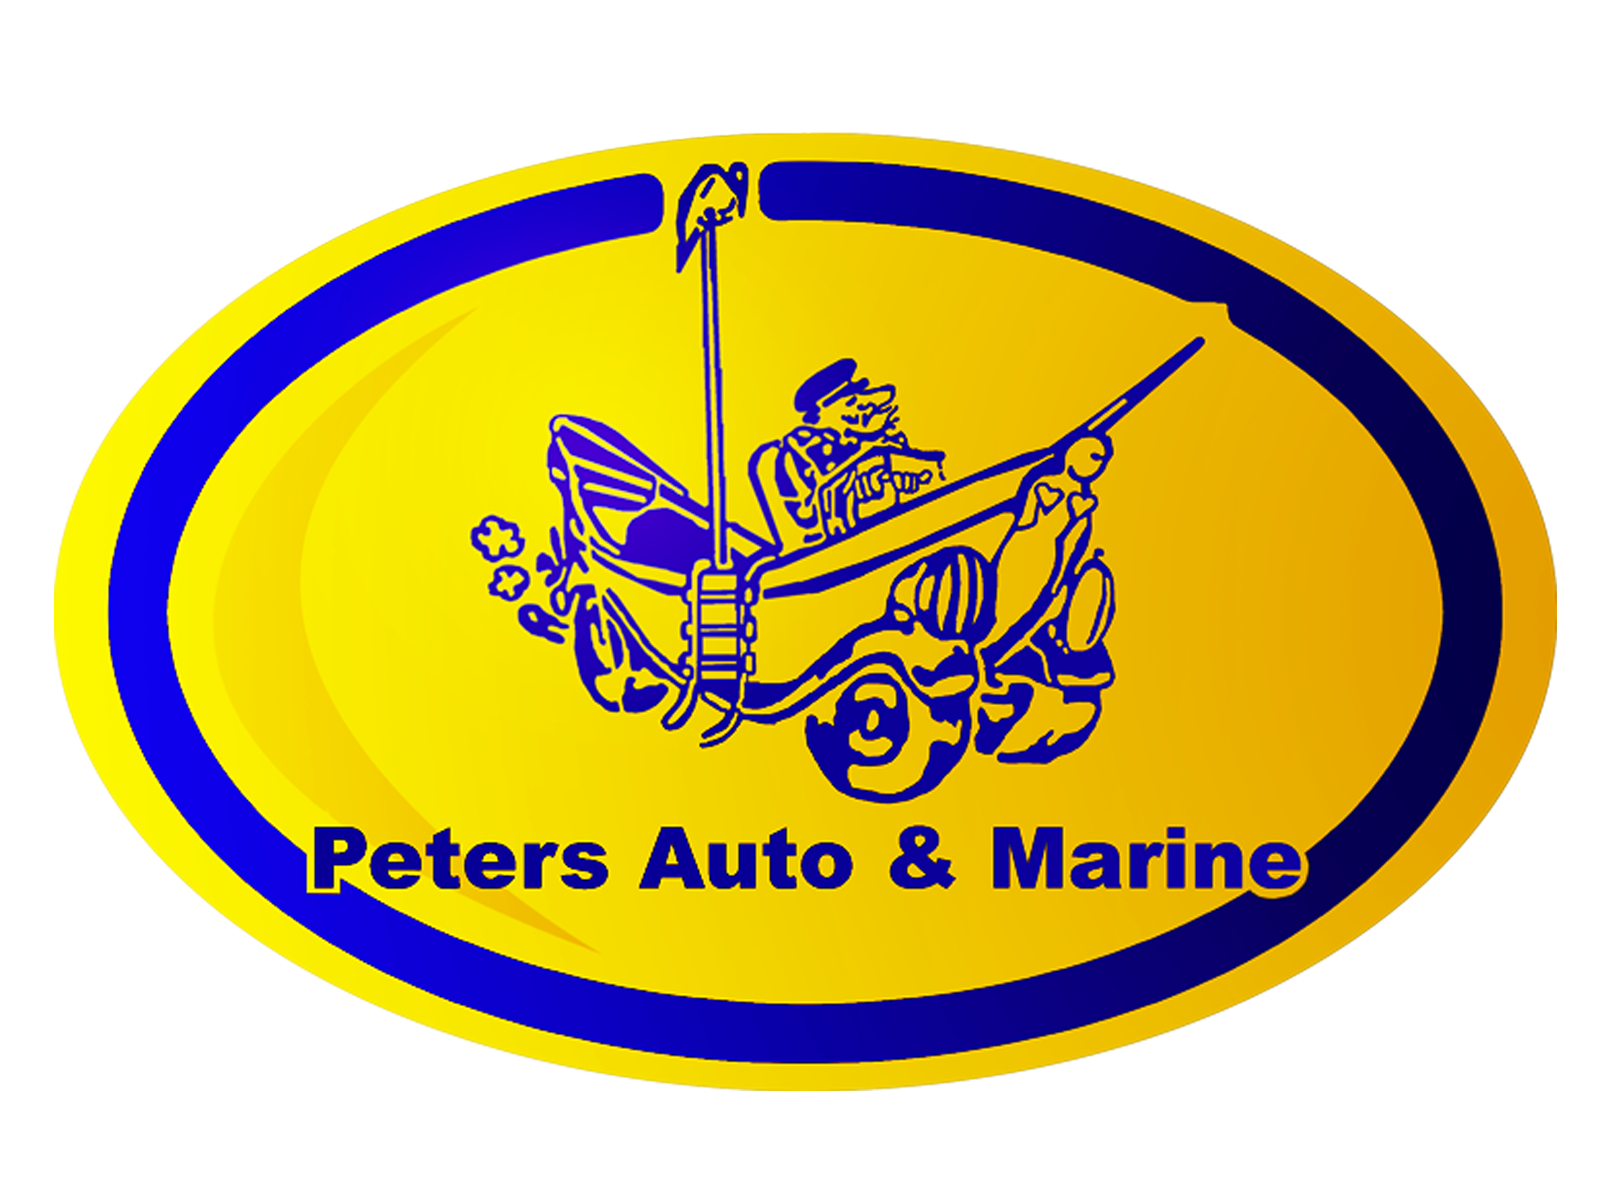 Peters Auto & Marine - Hella Service Partner logo